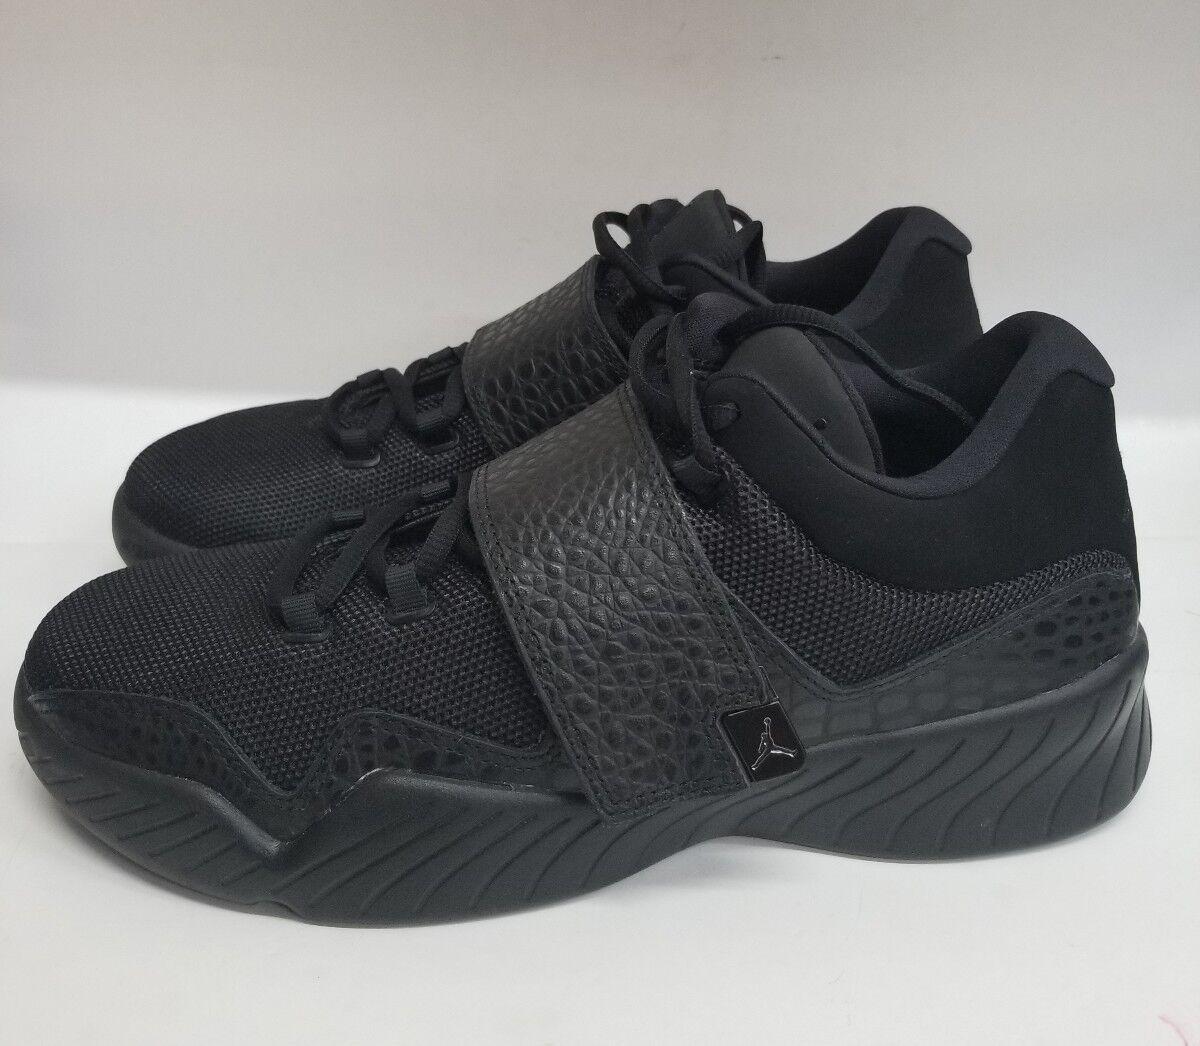 NEW Nike Air Jordan J23 Low Black/Black Men's Size 10 Shoes 854557-001